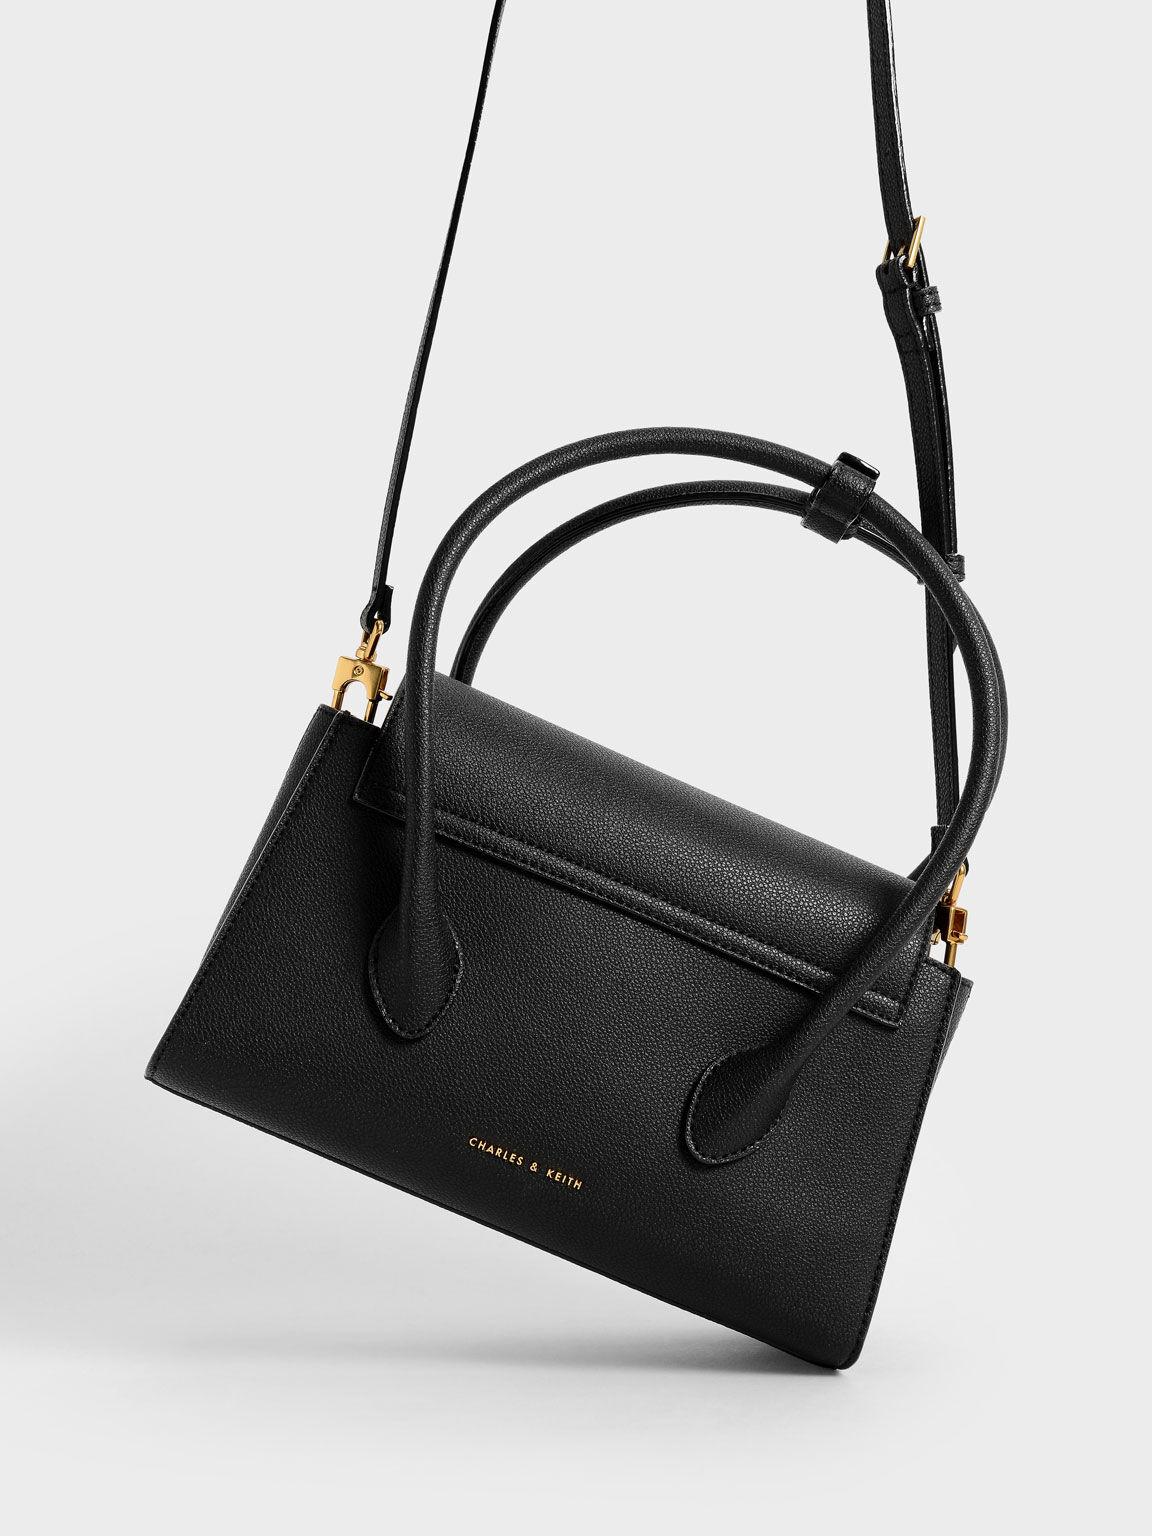 Double Handle Push-Lock Bag, Black, hi-res